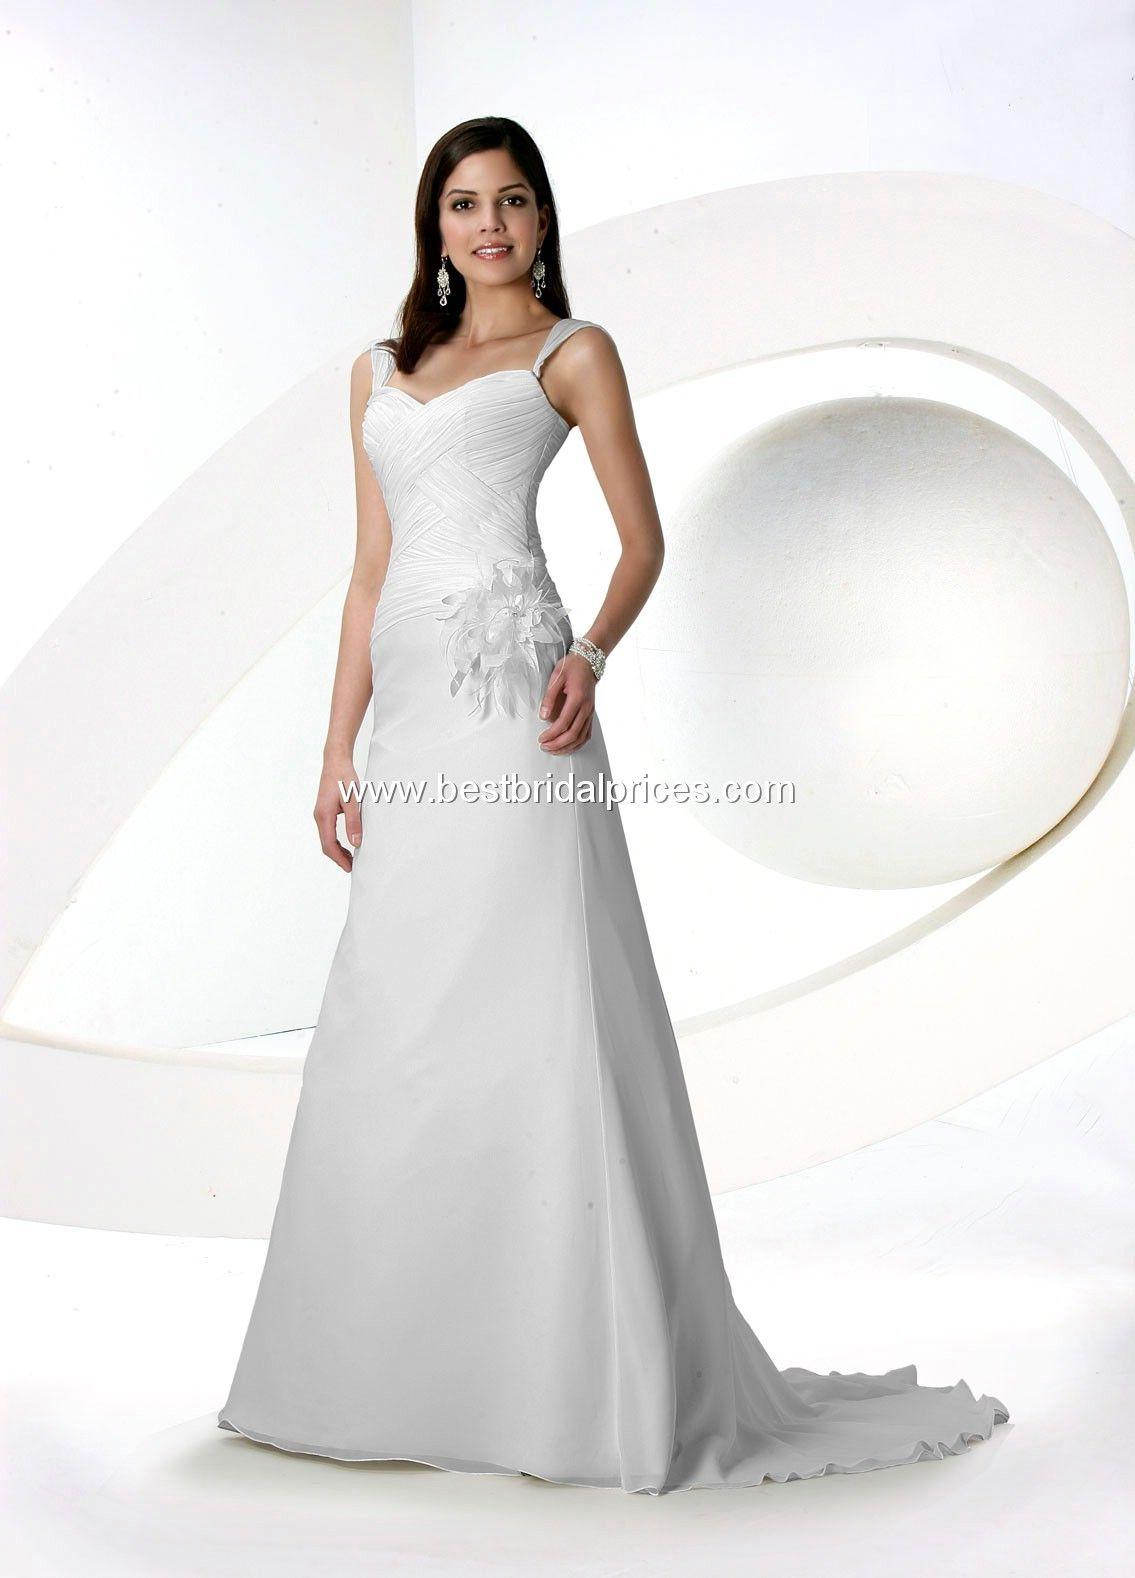 Style limited edition wedding gowns davinci bridal